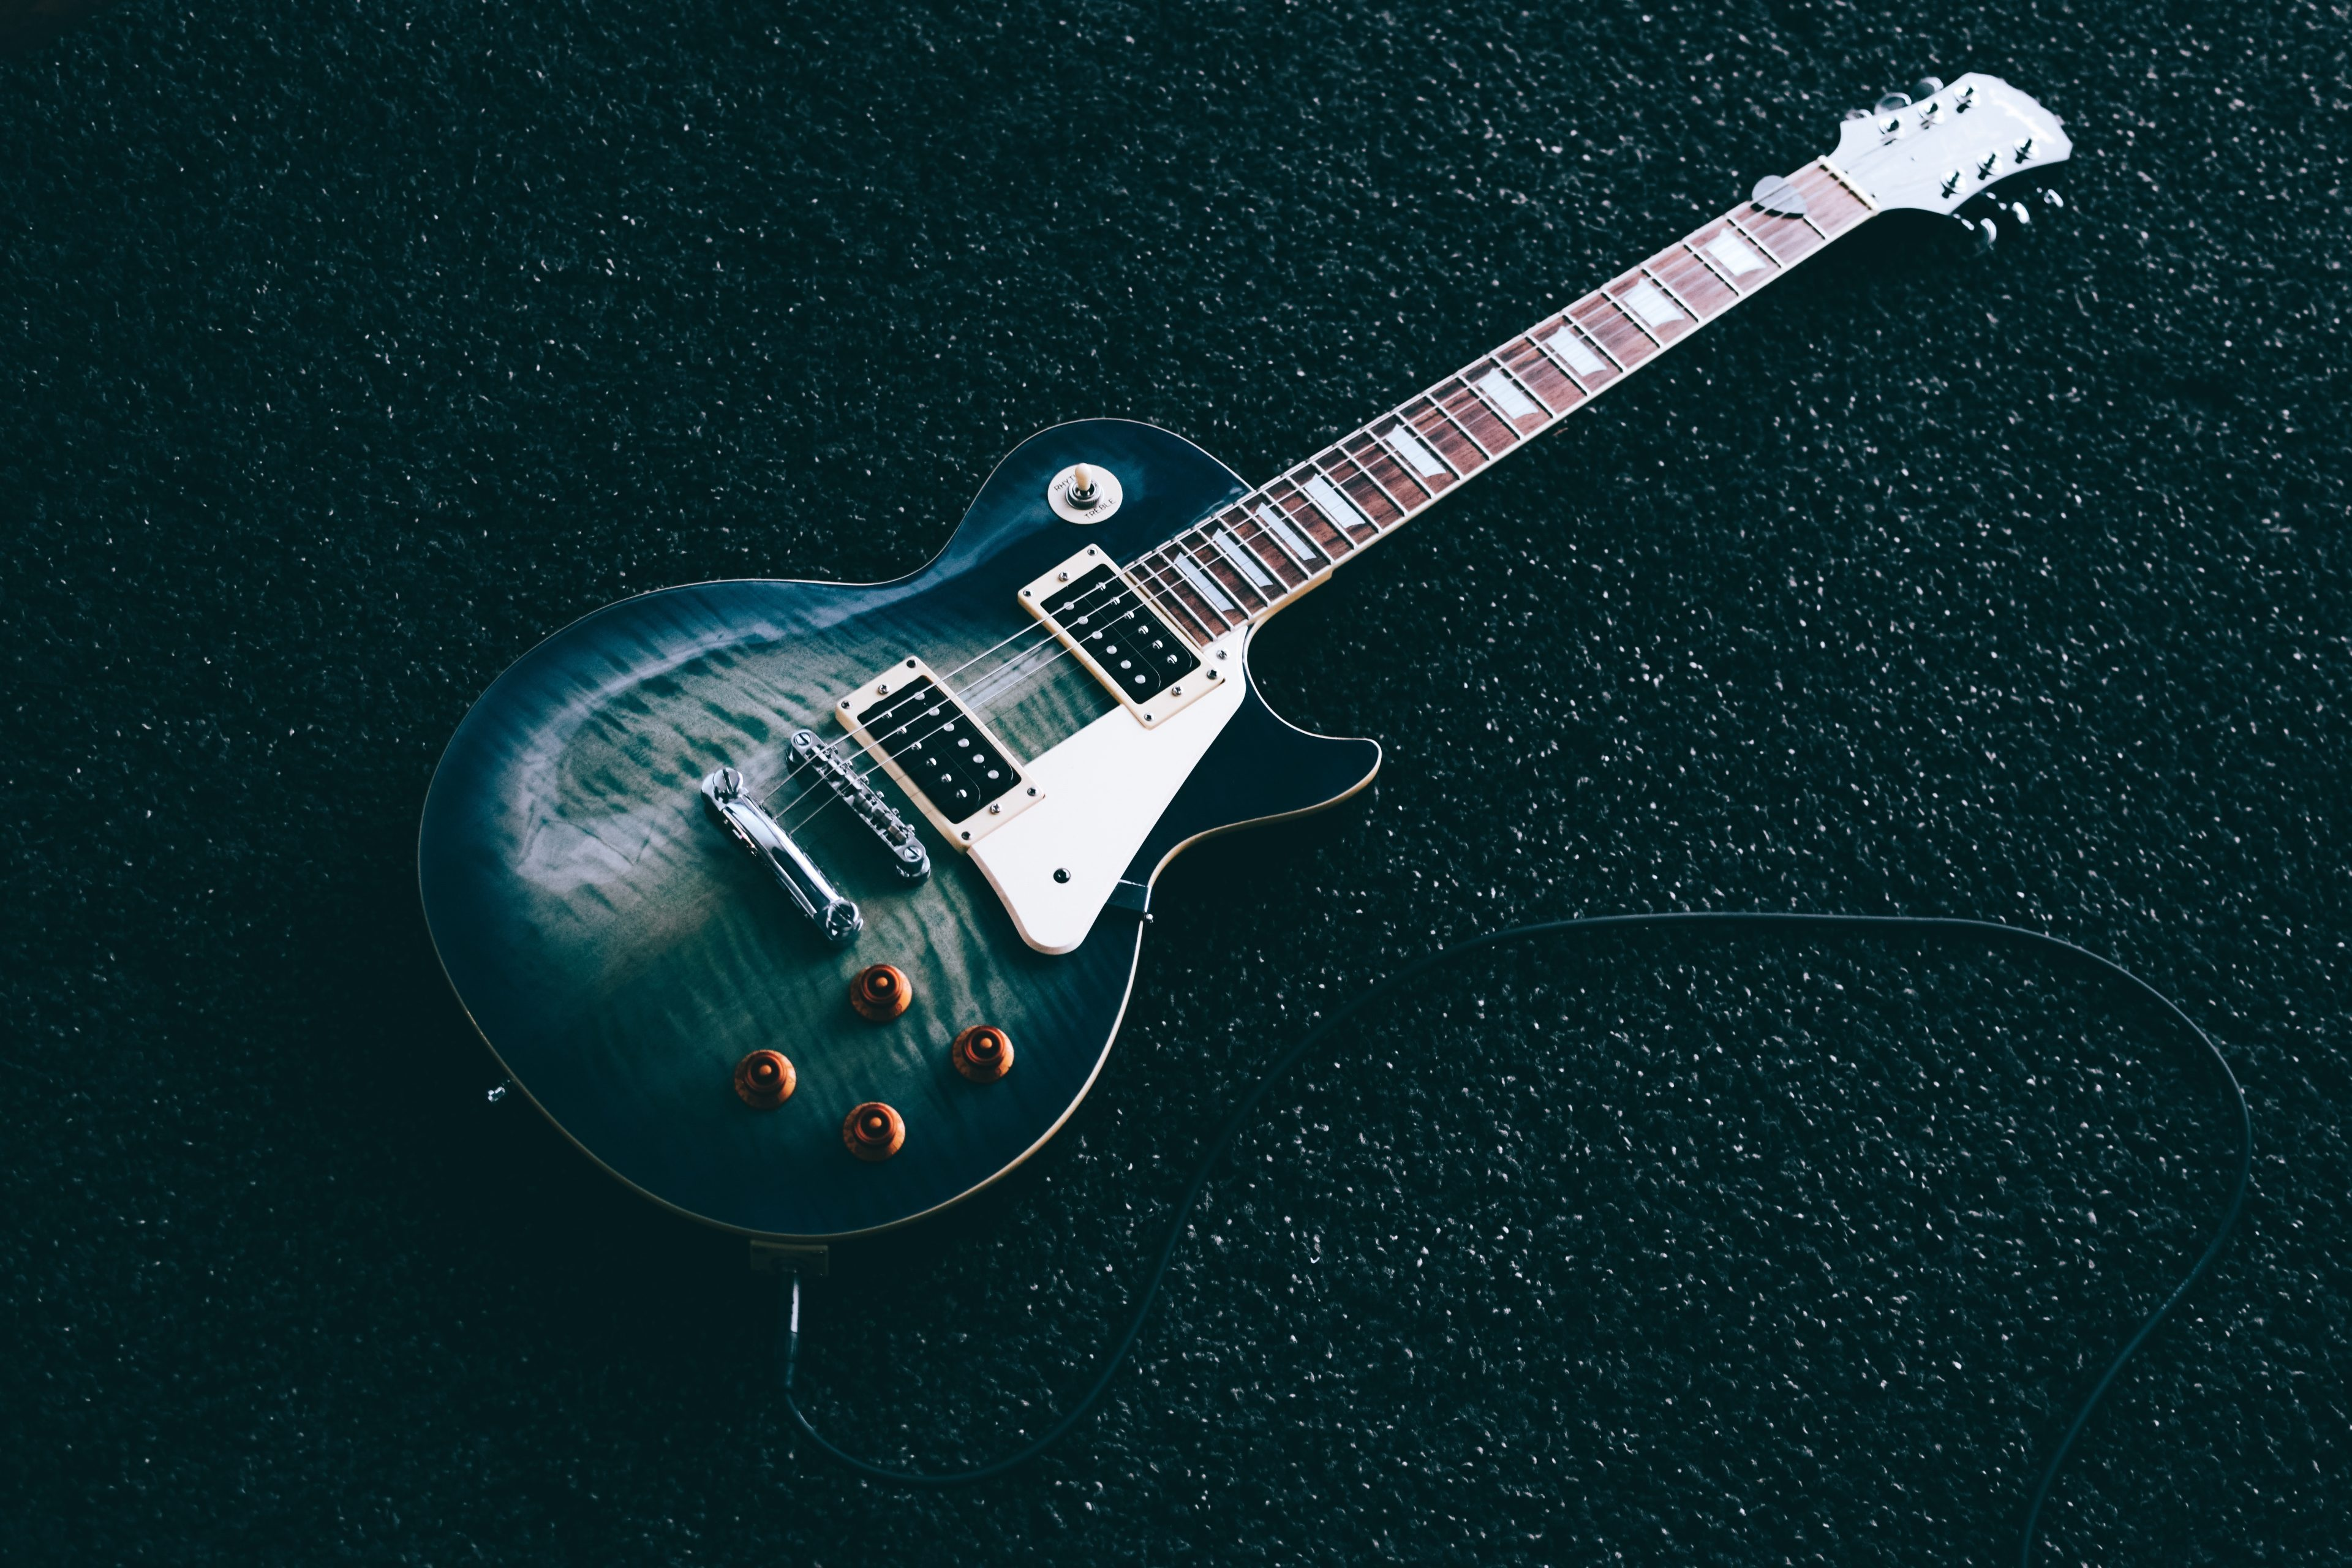 4k Guitar Wallpapers Top Free 4k Guitar Backgrounds Wallpaperaccess